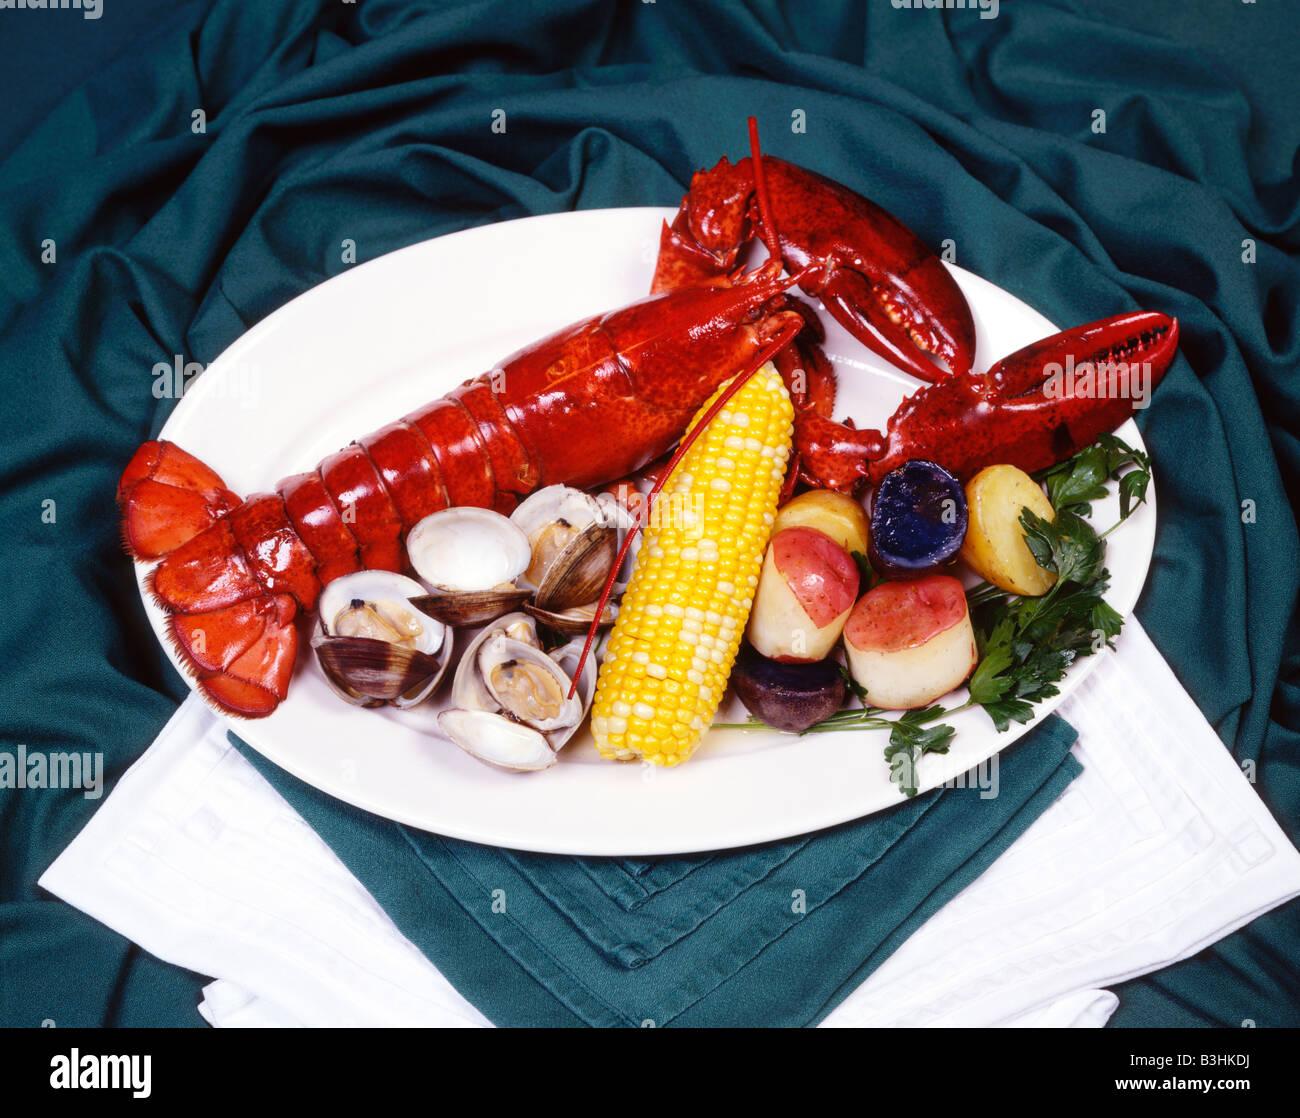 Seafood Lobster Clams Corn on Cob Potato Dinner Plate Platter Christmas Ornament